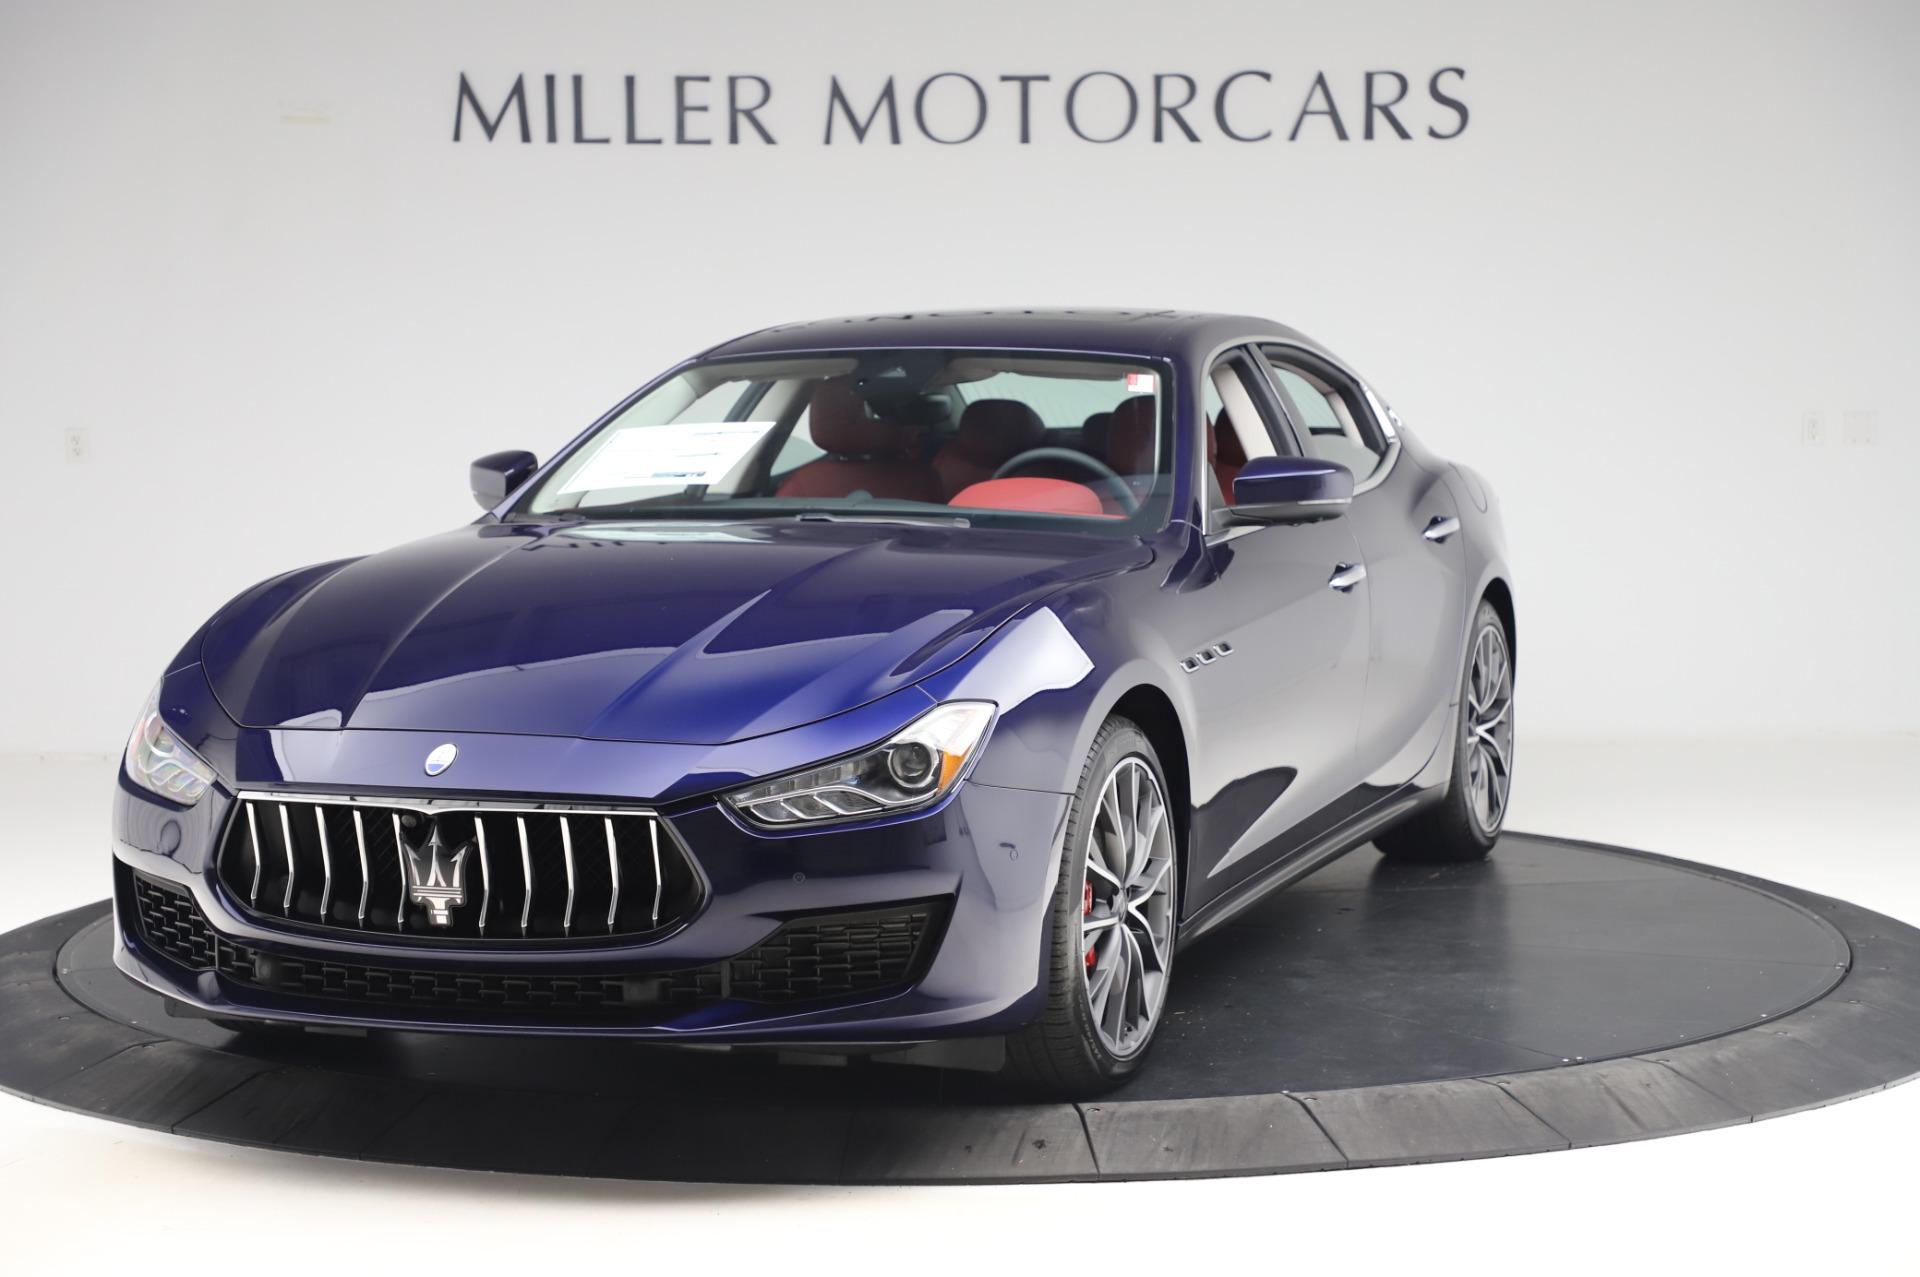 New 2020 Maserati Ghibli S Q4 for sale Sold at Maserati of Greenwich in Greenwich CT 06830 1